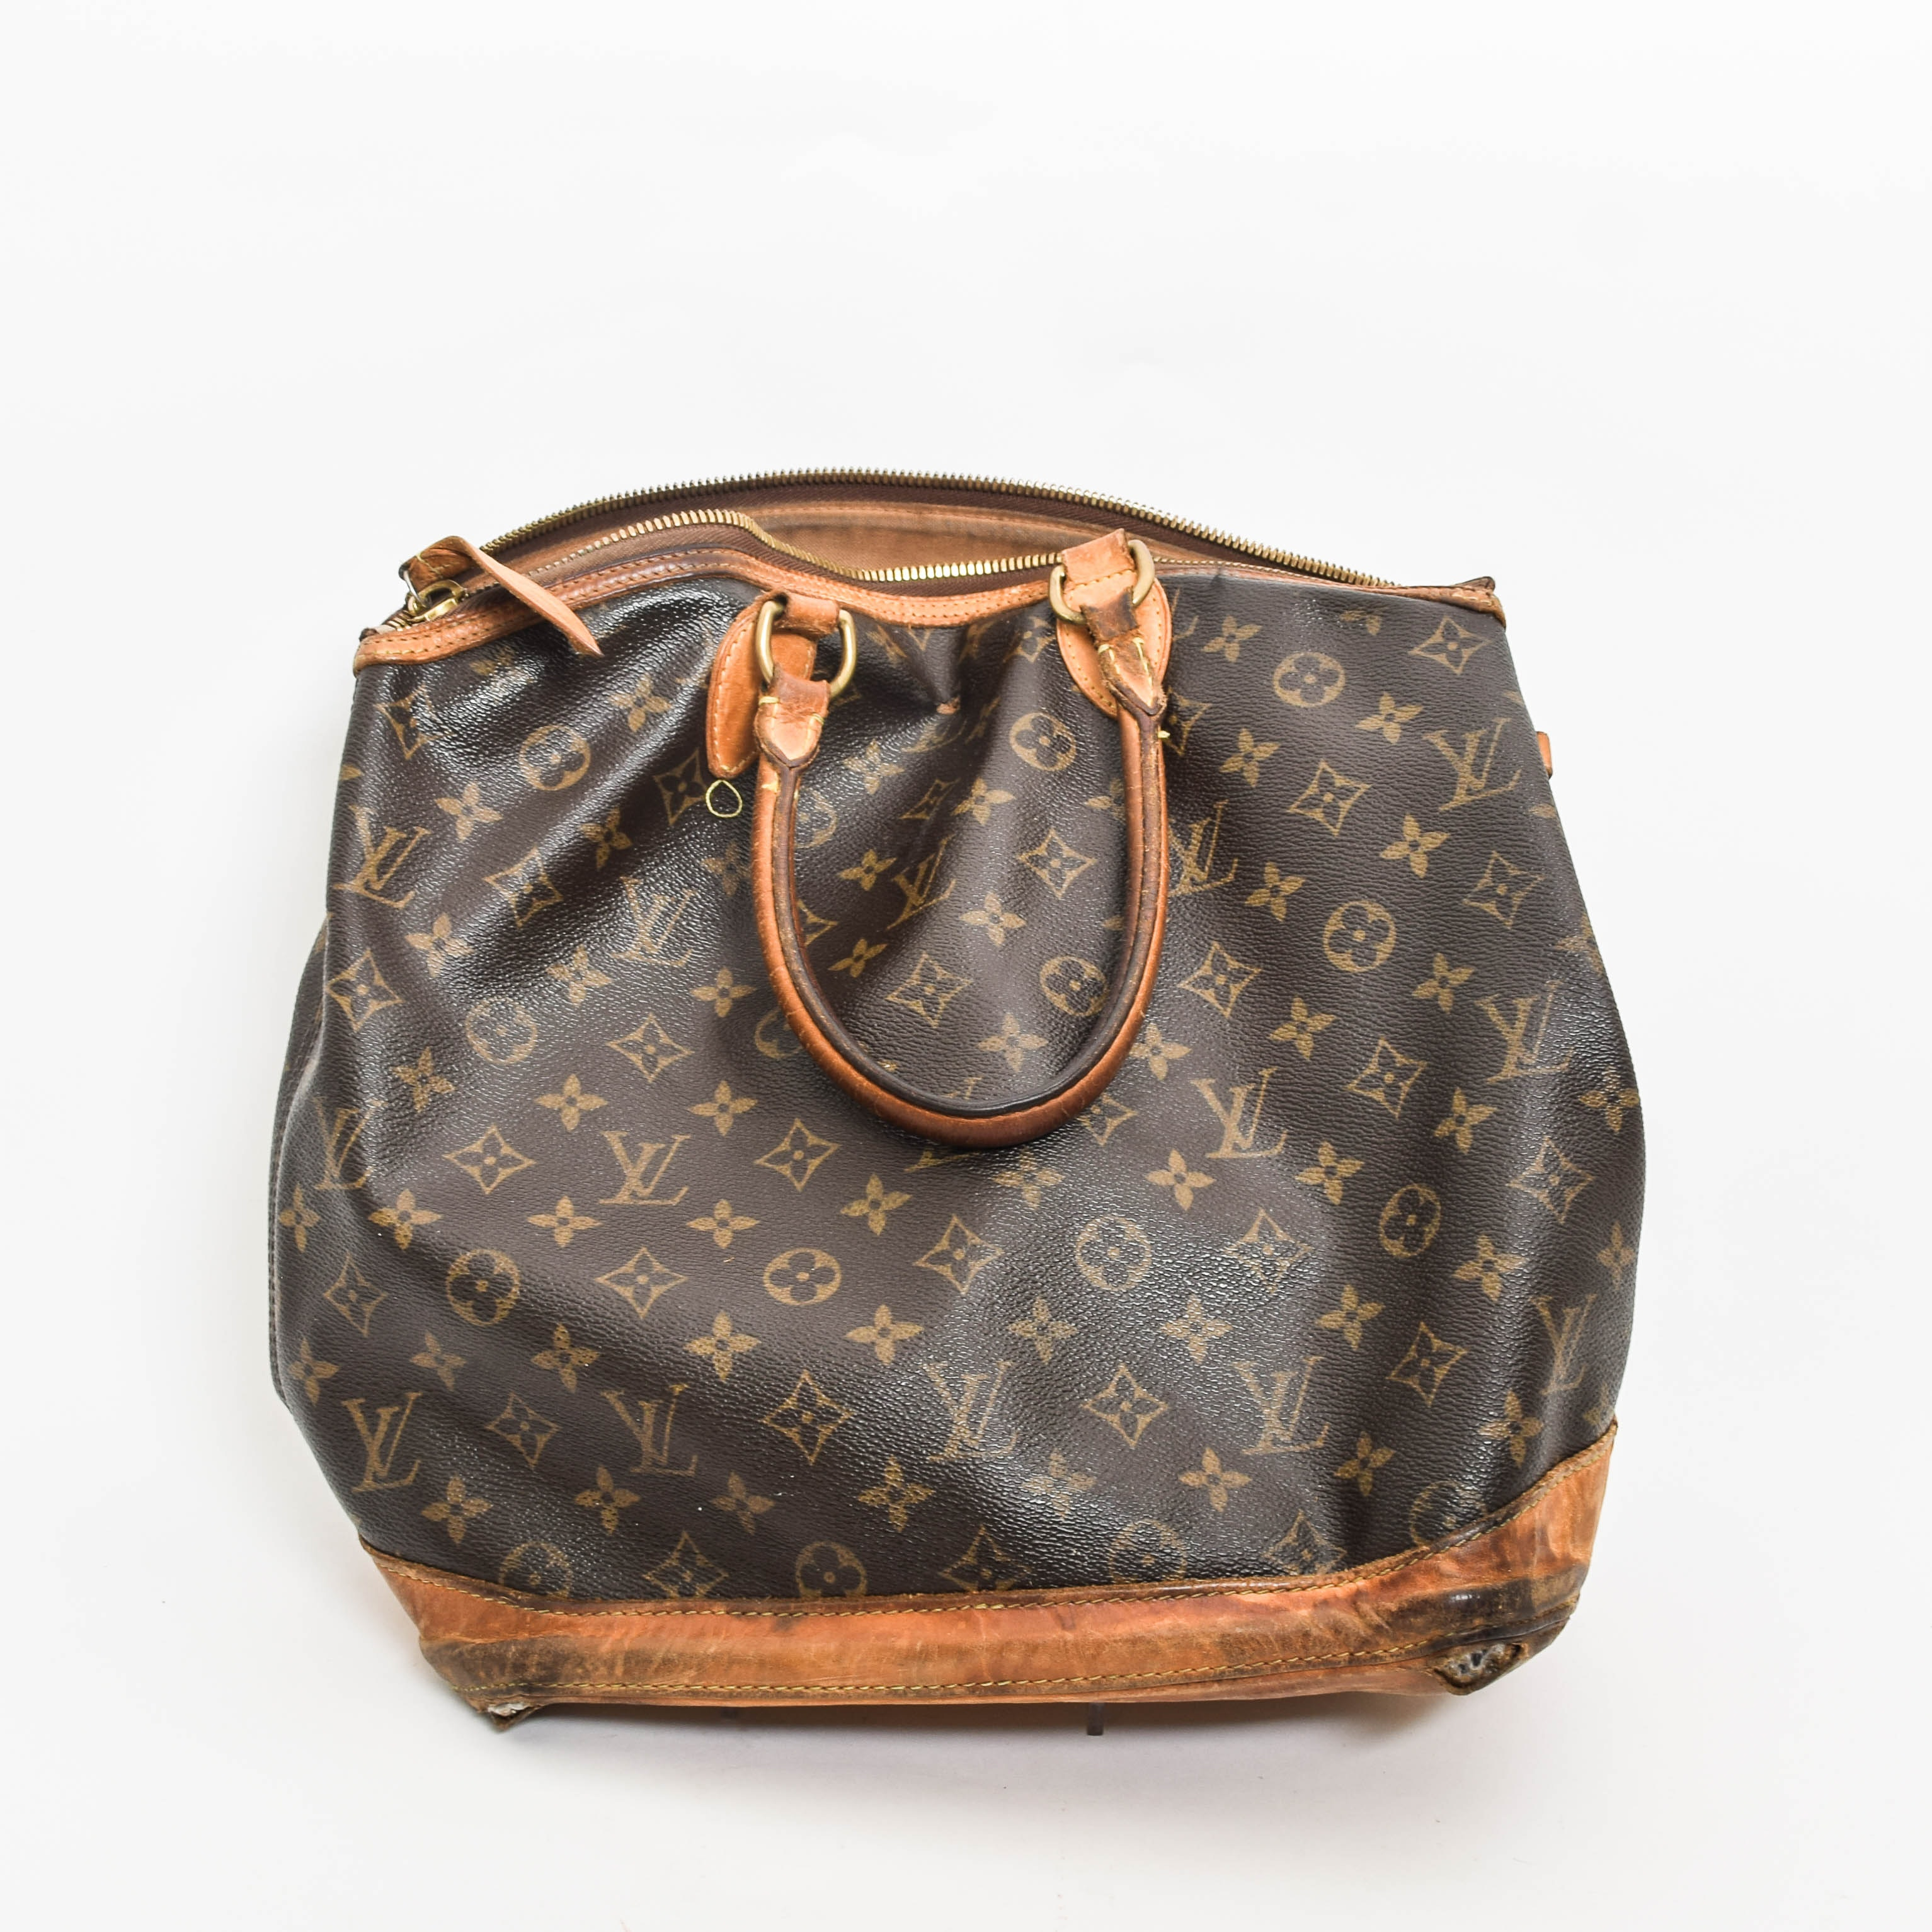 Vintage Louis Vuitton Alma Handbag